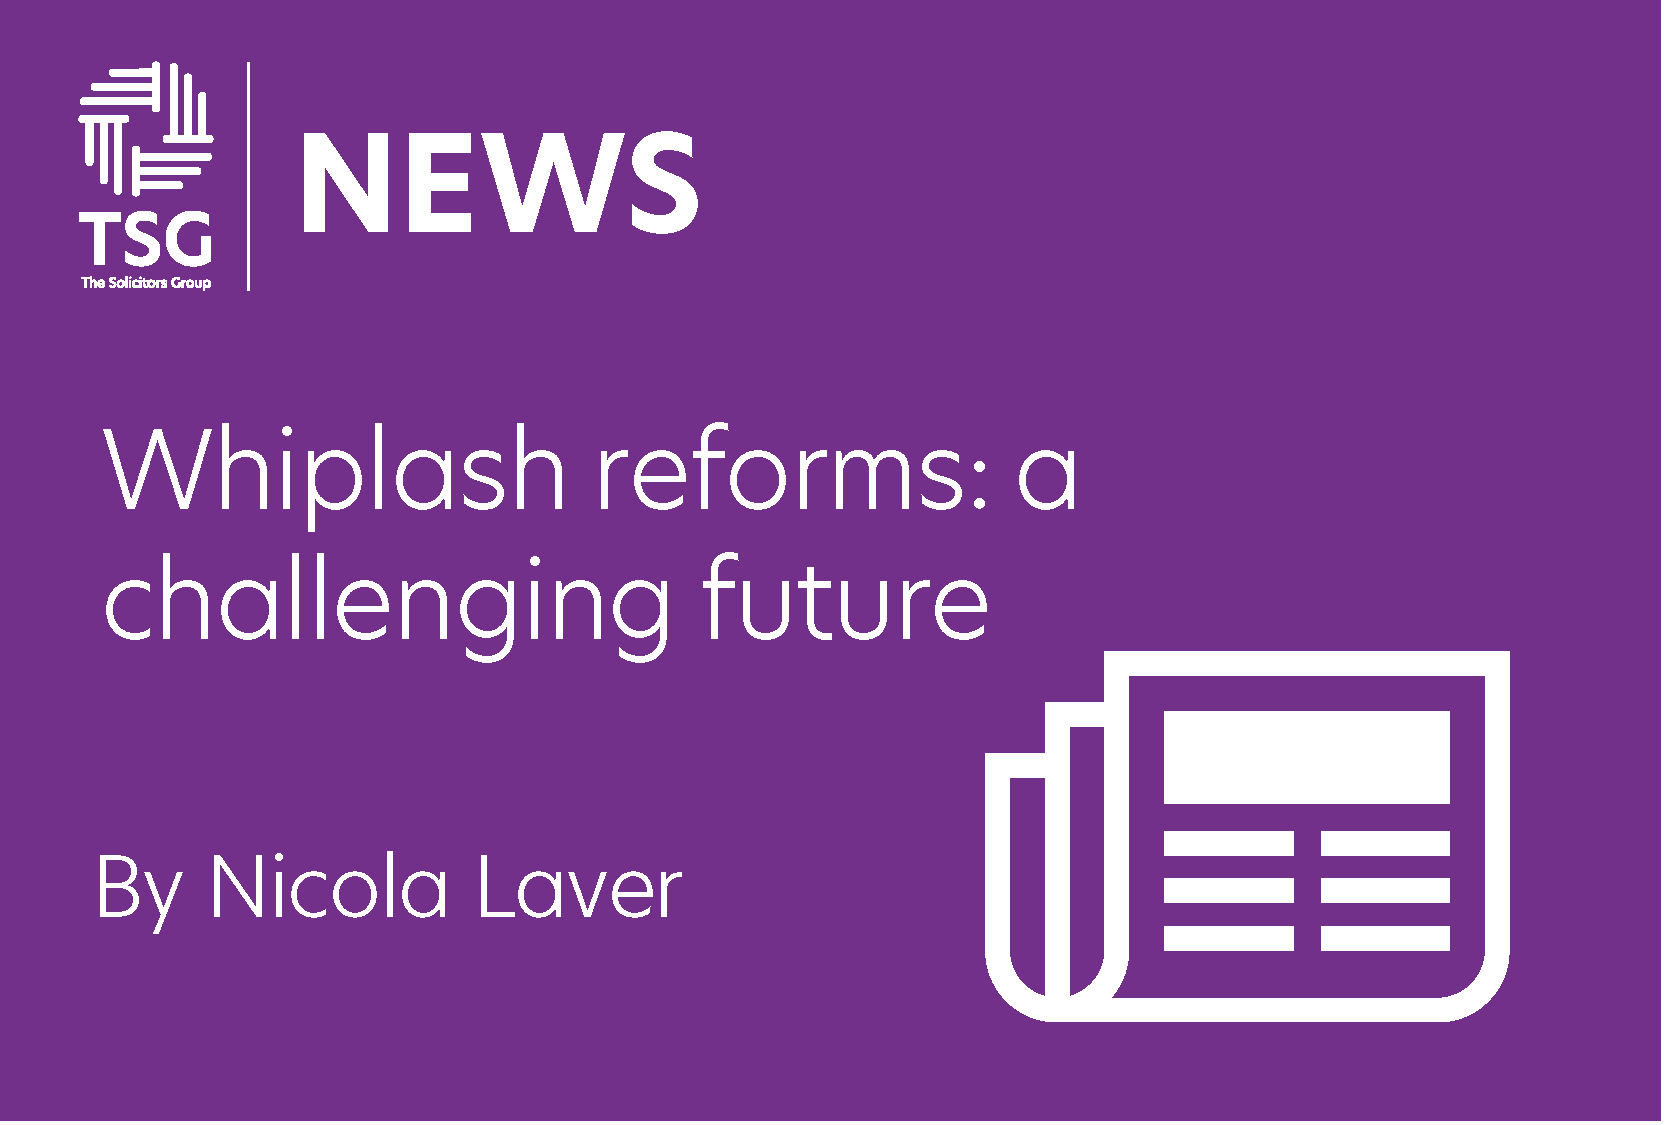 Whiplash reforms